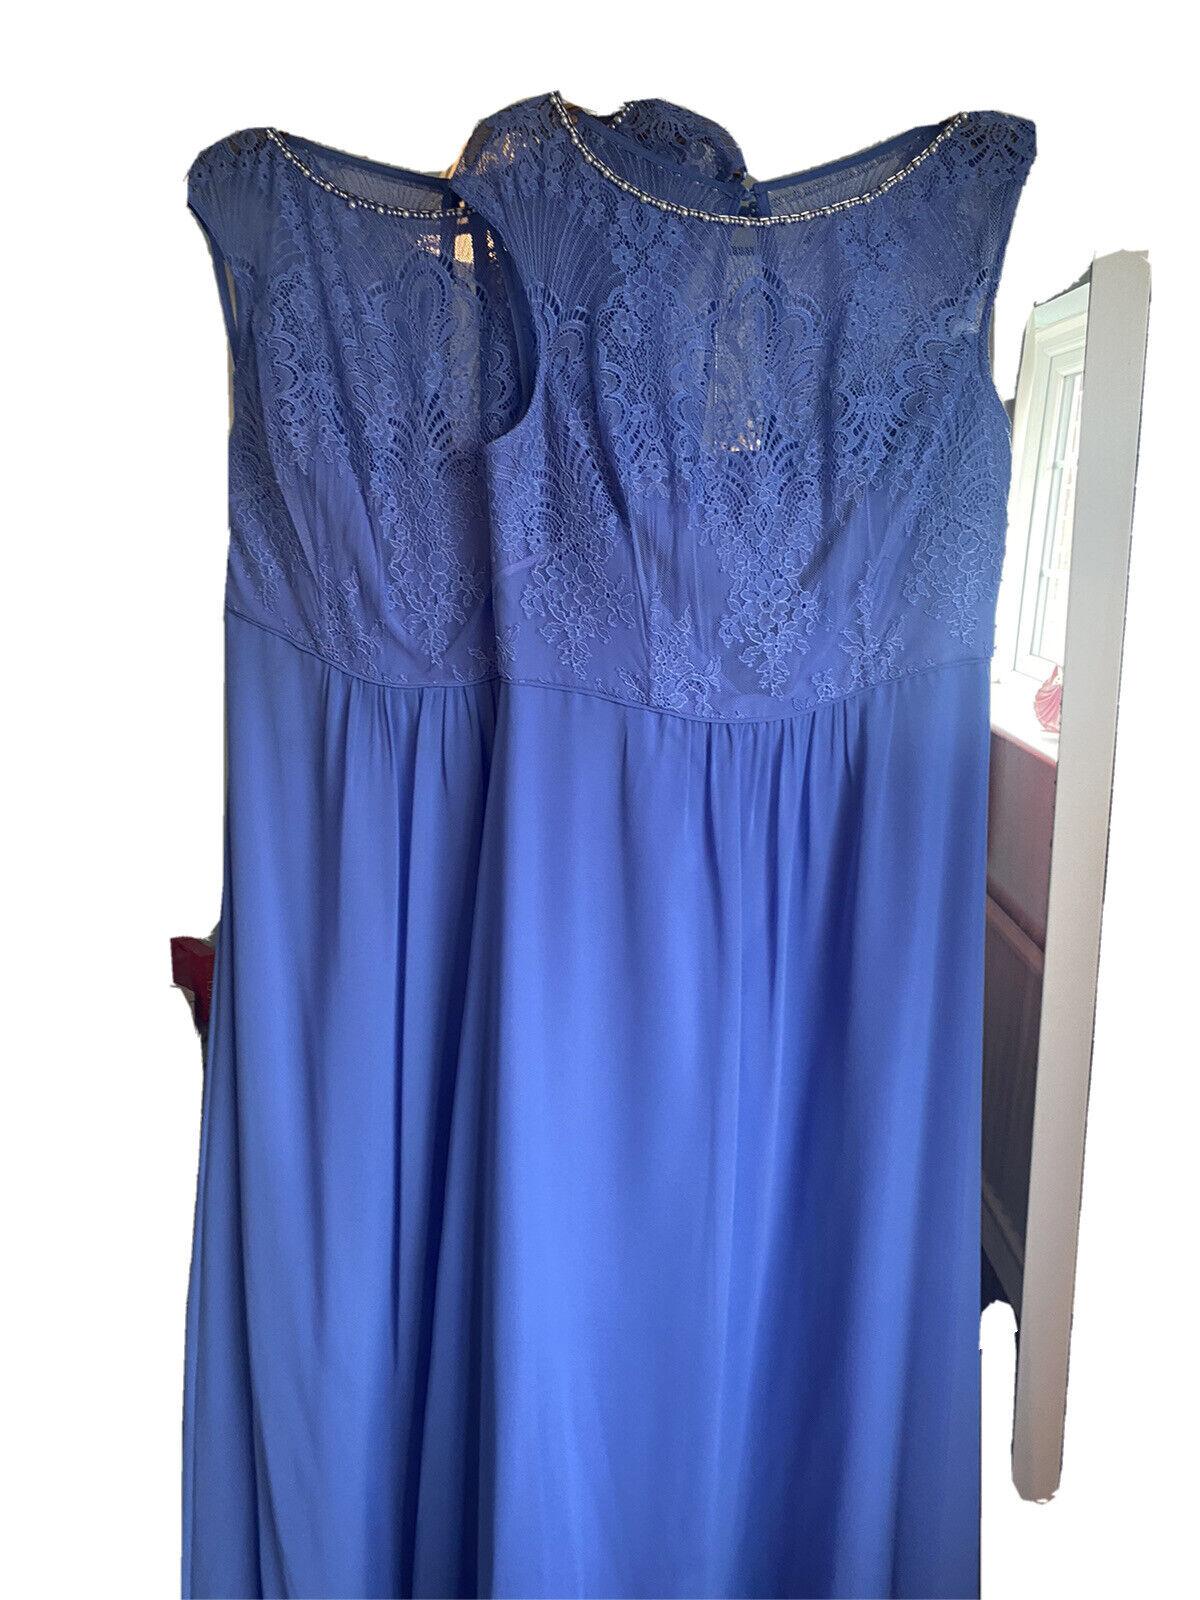 X 2 Size 12 Bridesmaid Dresses